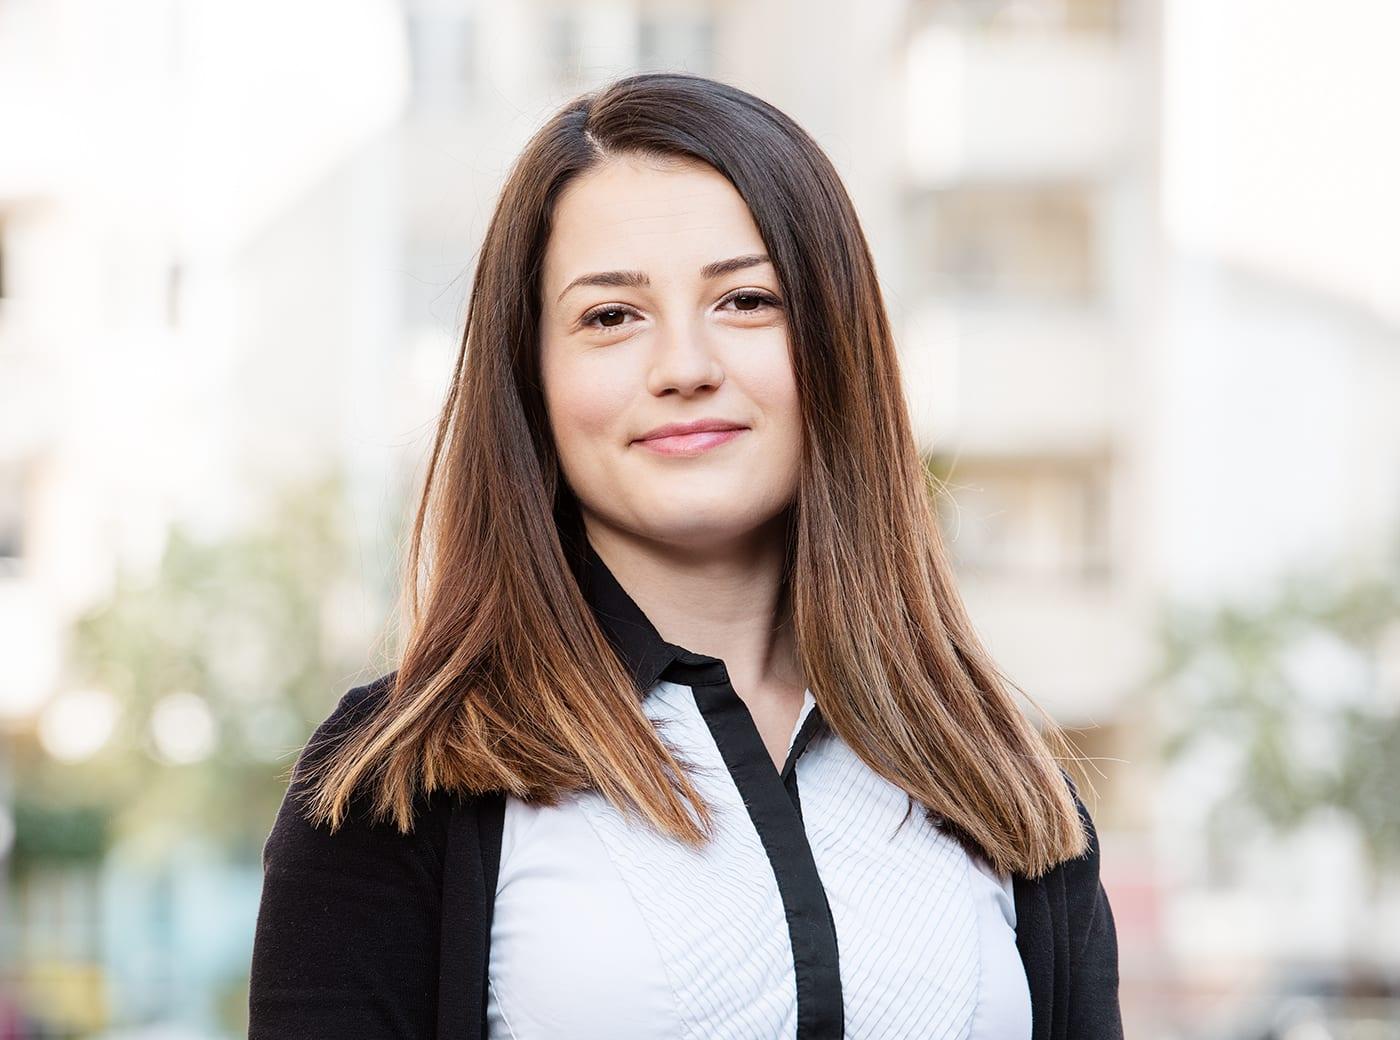 Dzanila Karaselimovic